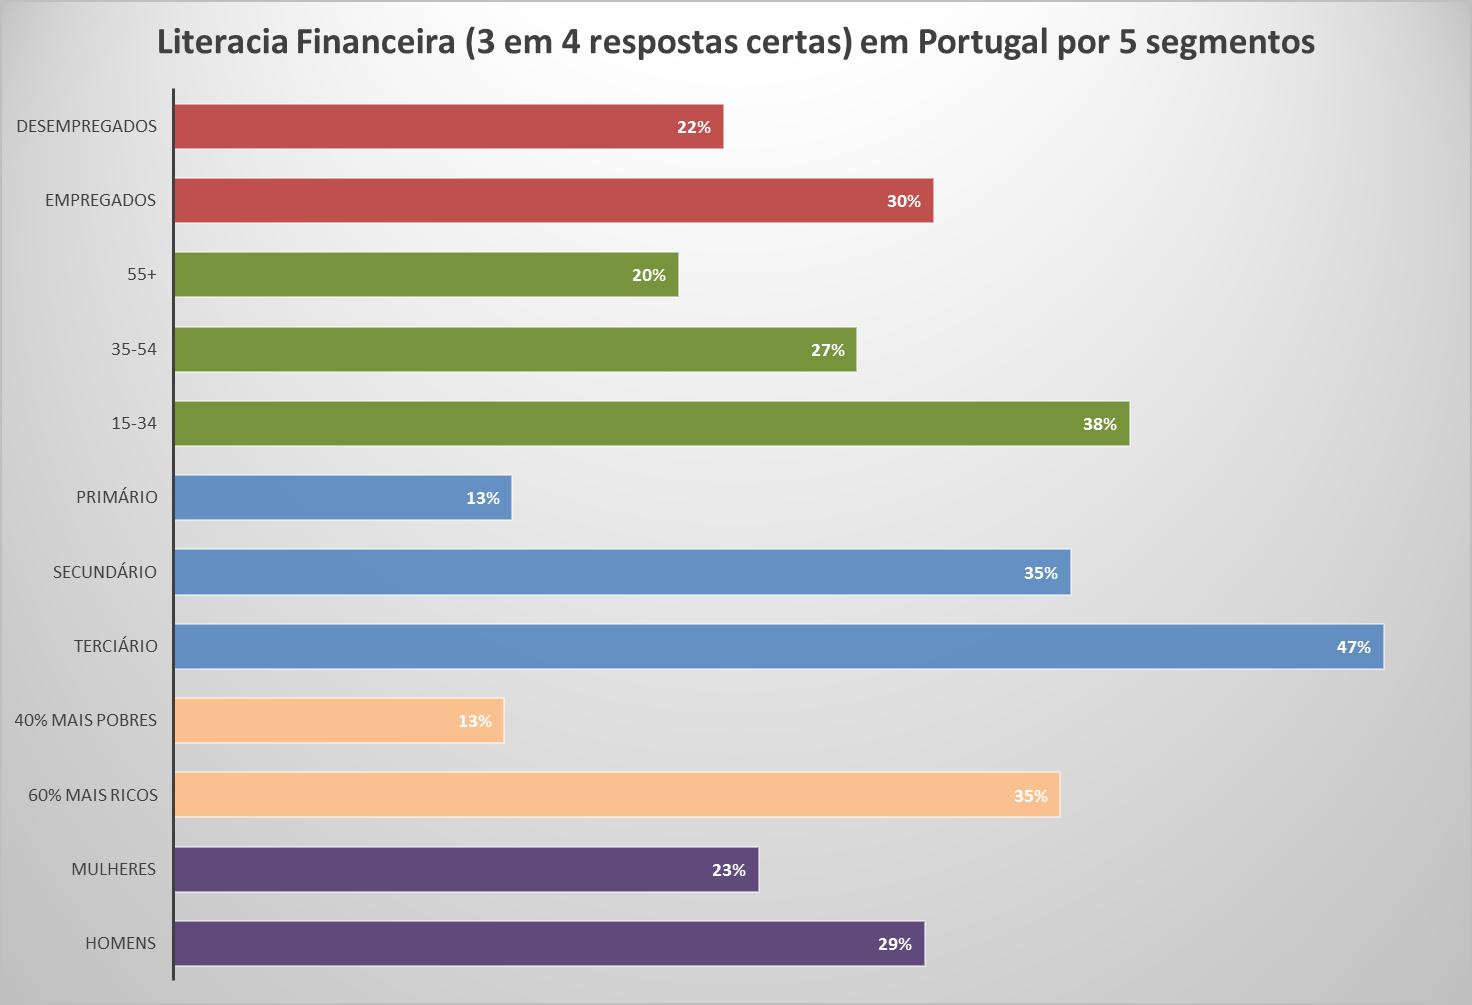 Literacia Financeira: Onde Erram os Portugueses?